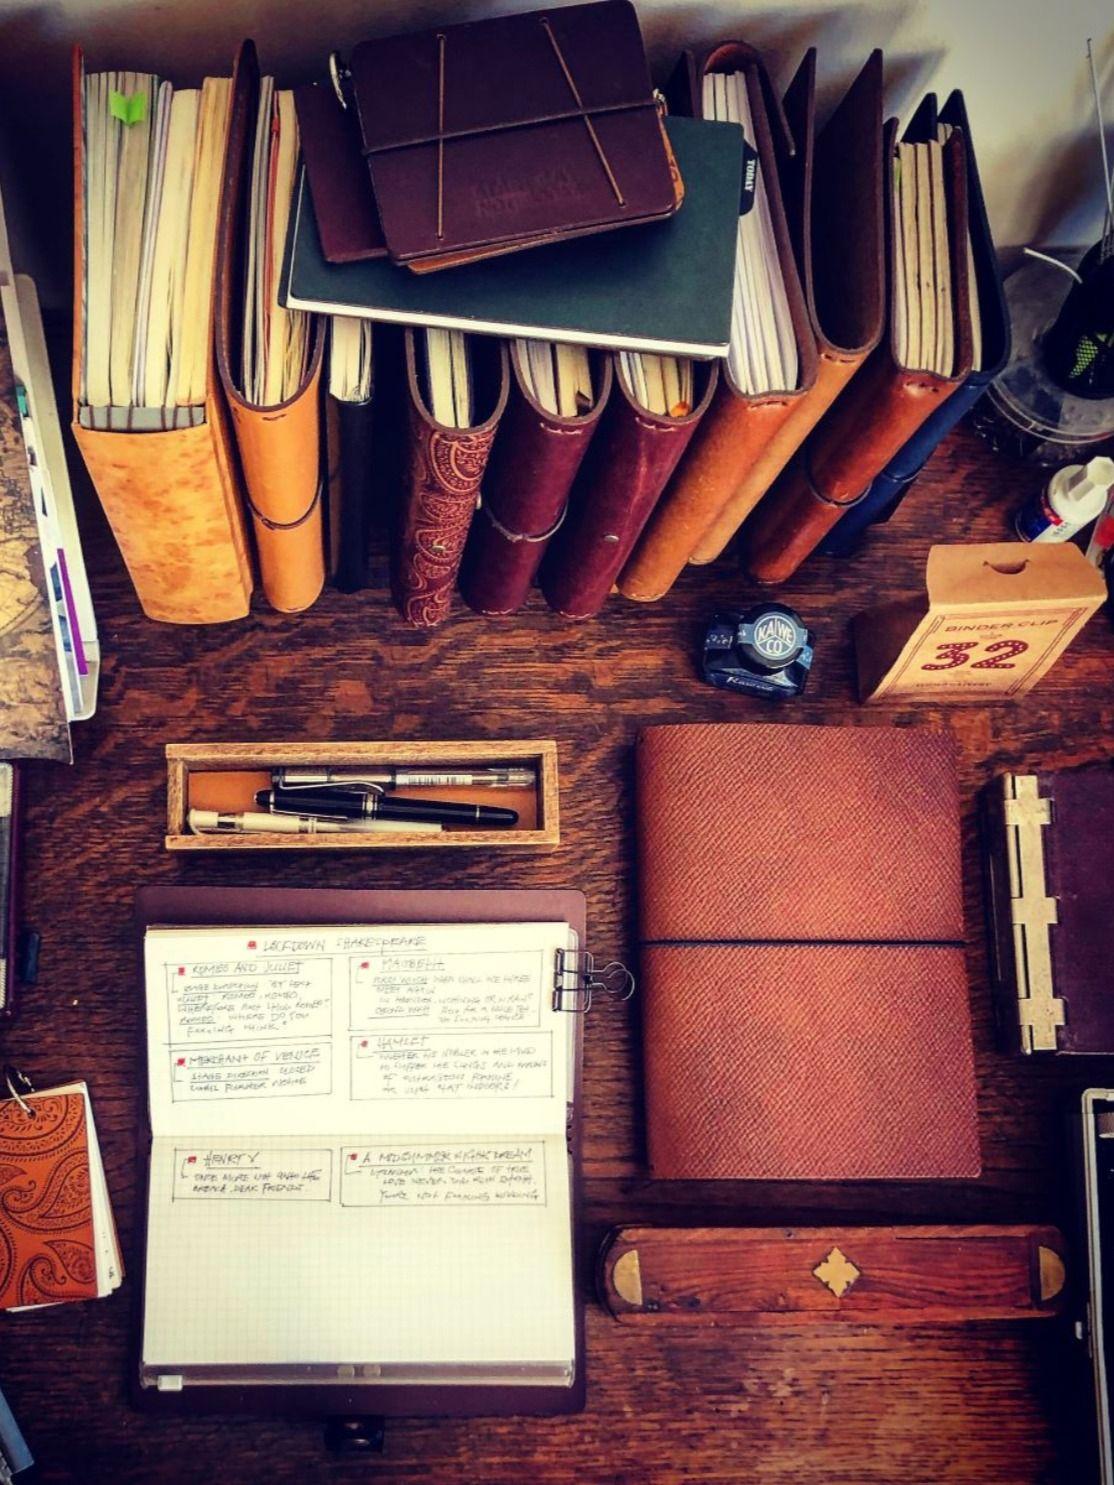 Using a travelers notebook as a planner. #travelersnotebook #notebook #journal #journaling #stationery #stationeryaddict #sketchbook #planner #artjournal #bulletjournal #onmydesk #fountainpen #startbaynotebooks